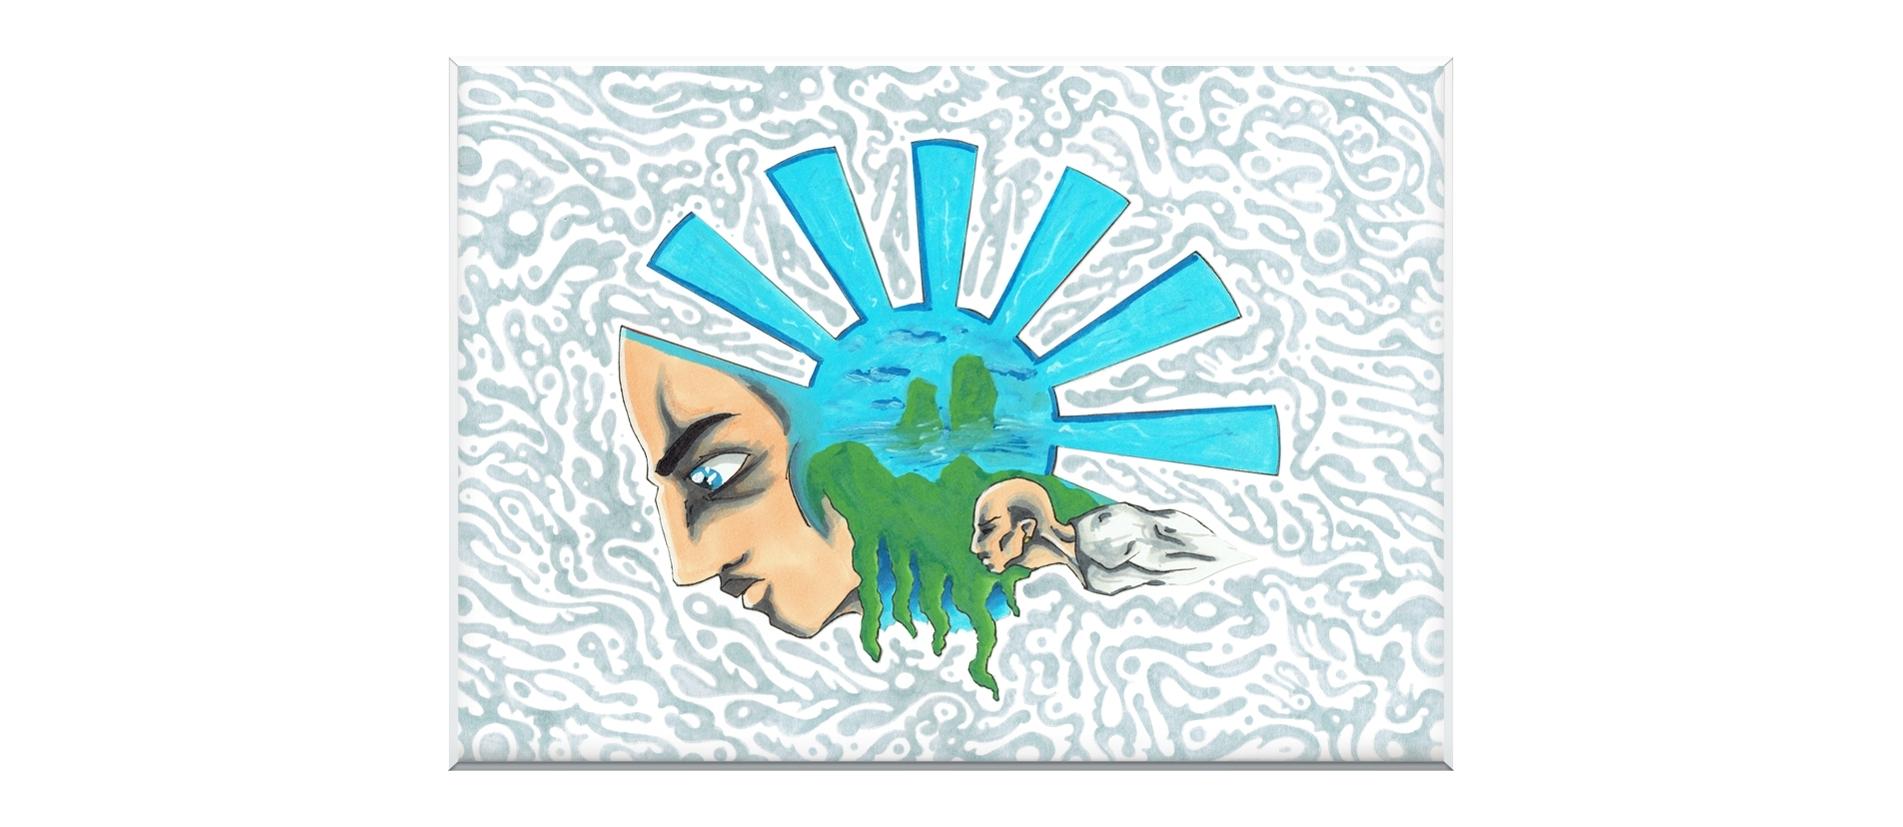 No Limitation II - The Cloudhatched Beginning - Bono Mourits